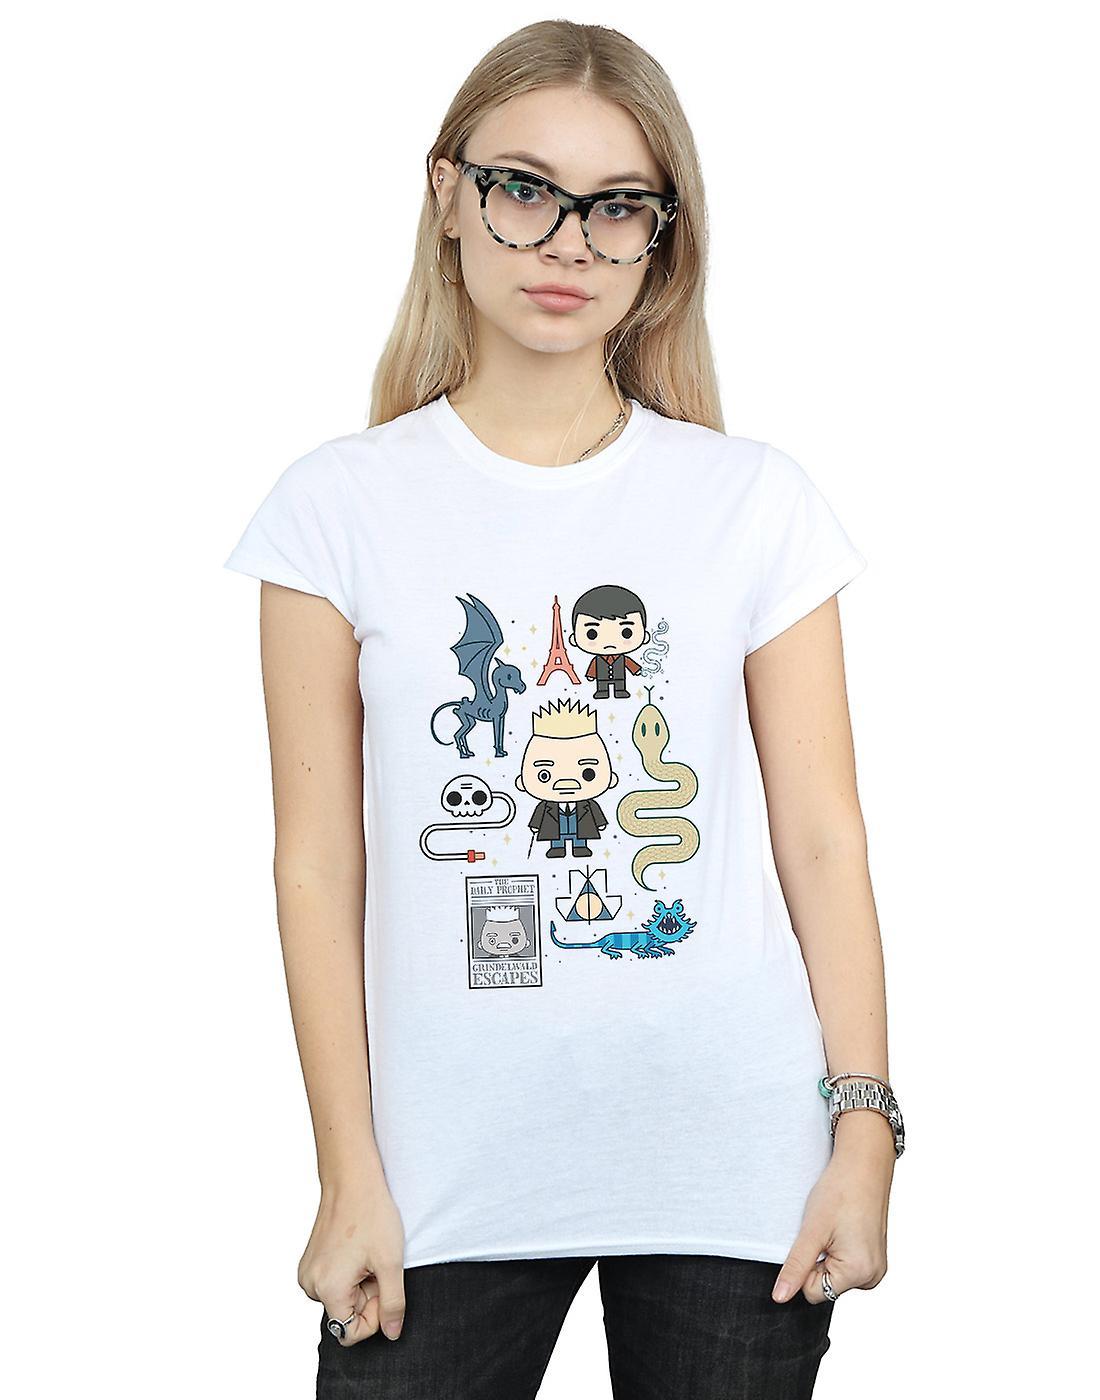 Fantastic Beasts Women's Chibi Grindelwald T-Shirt